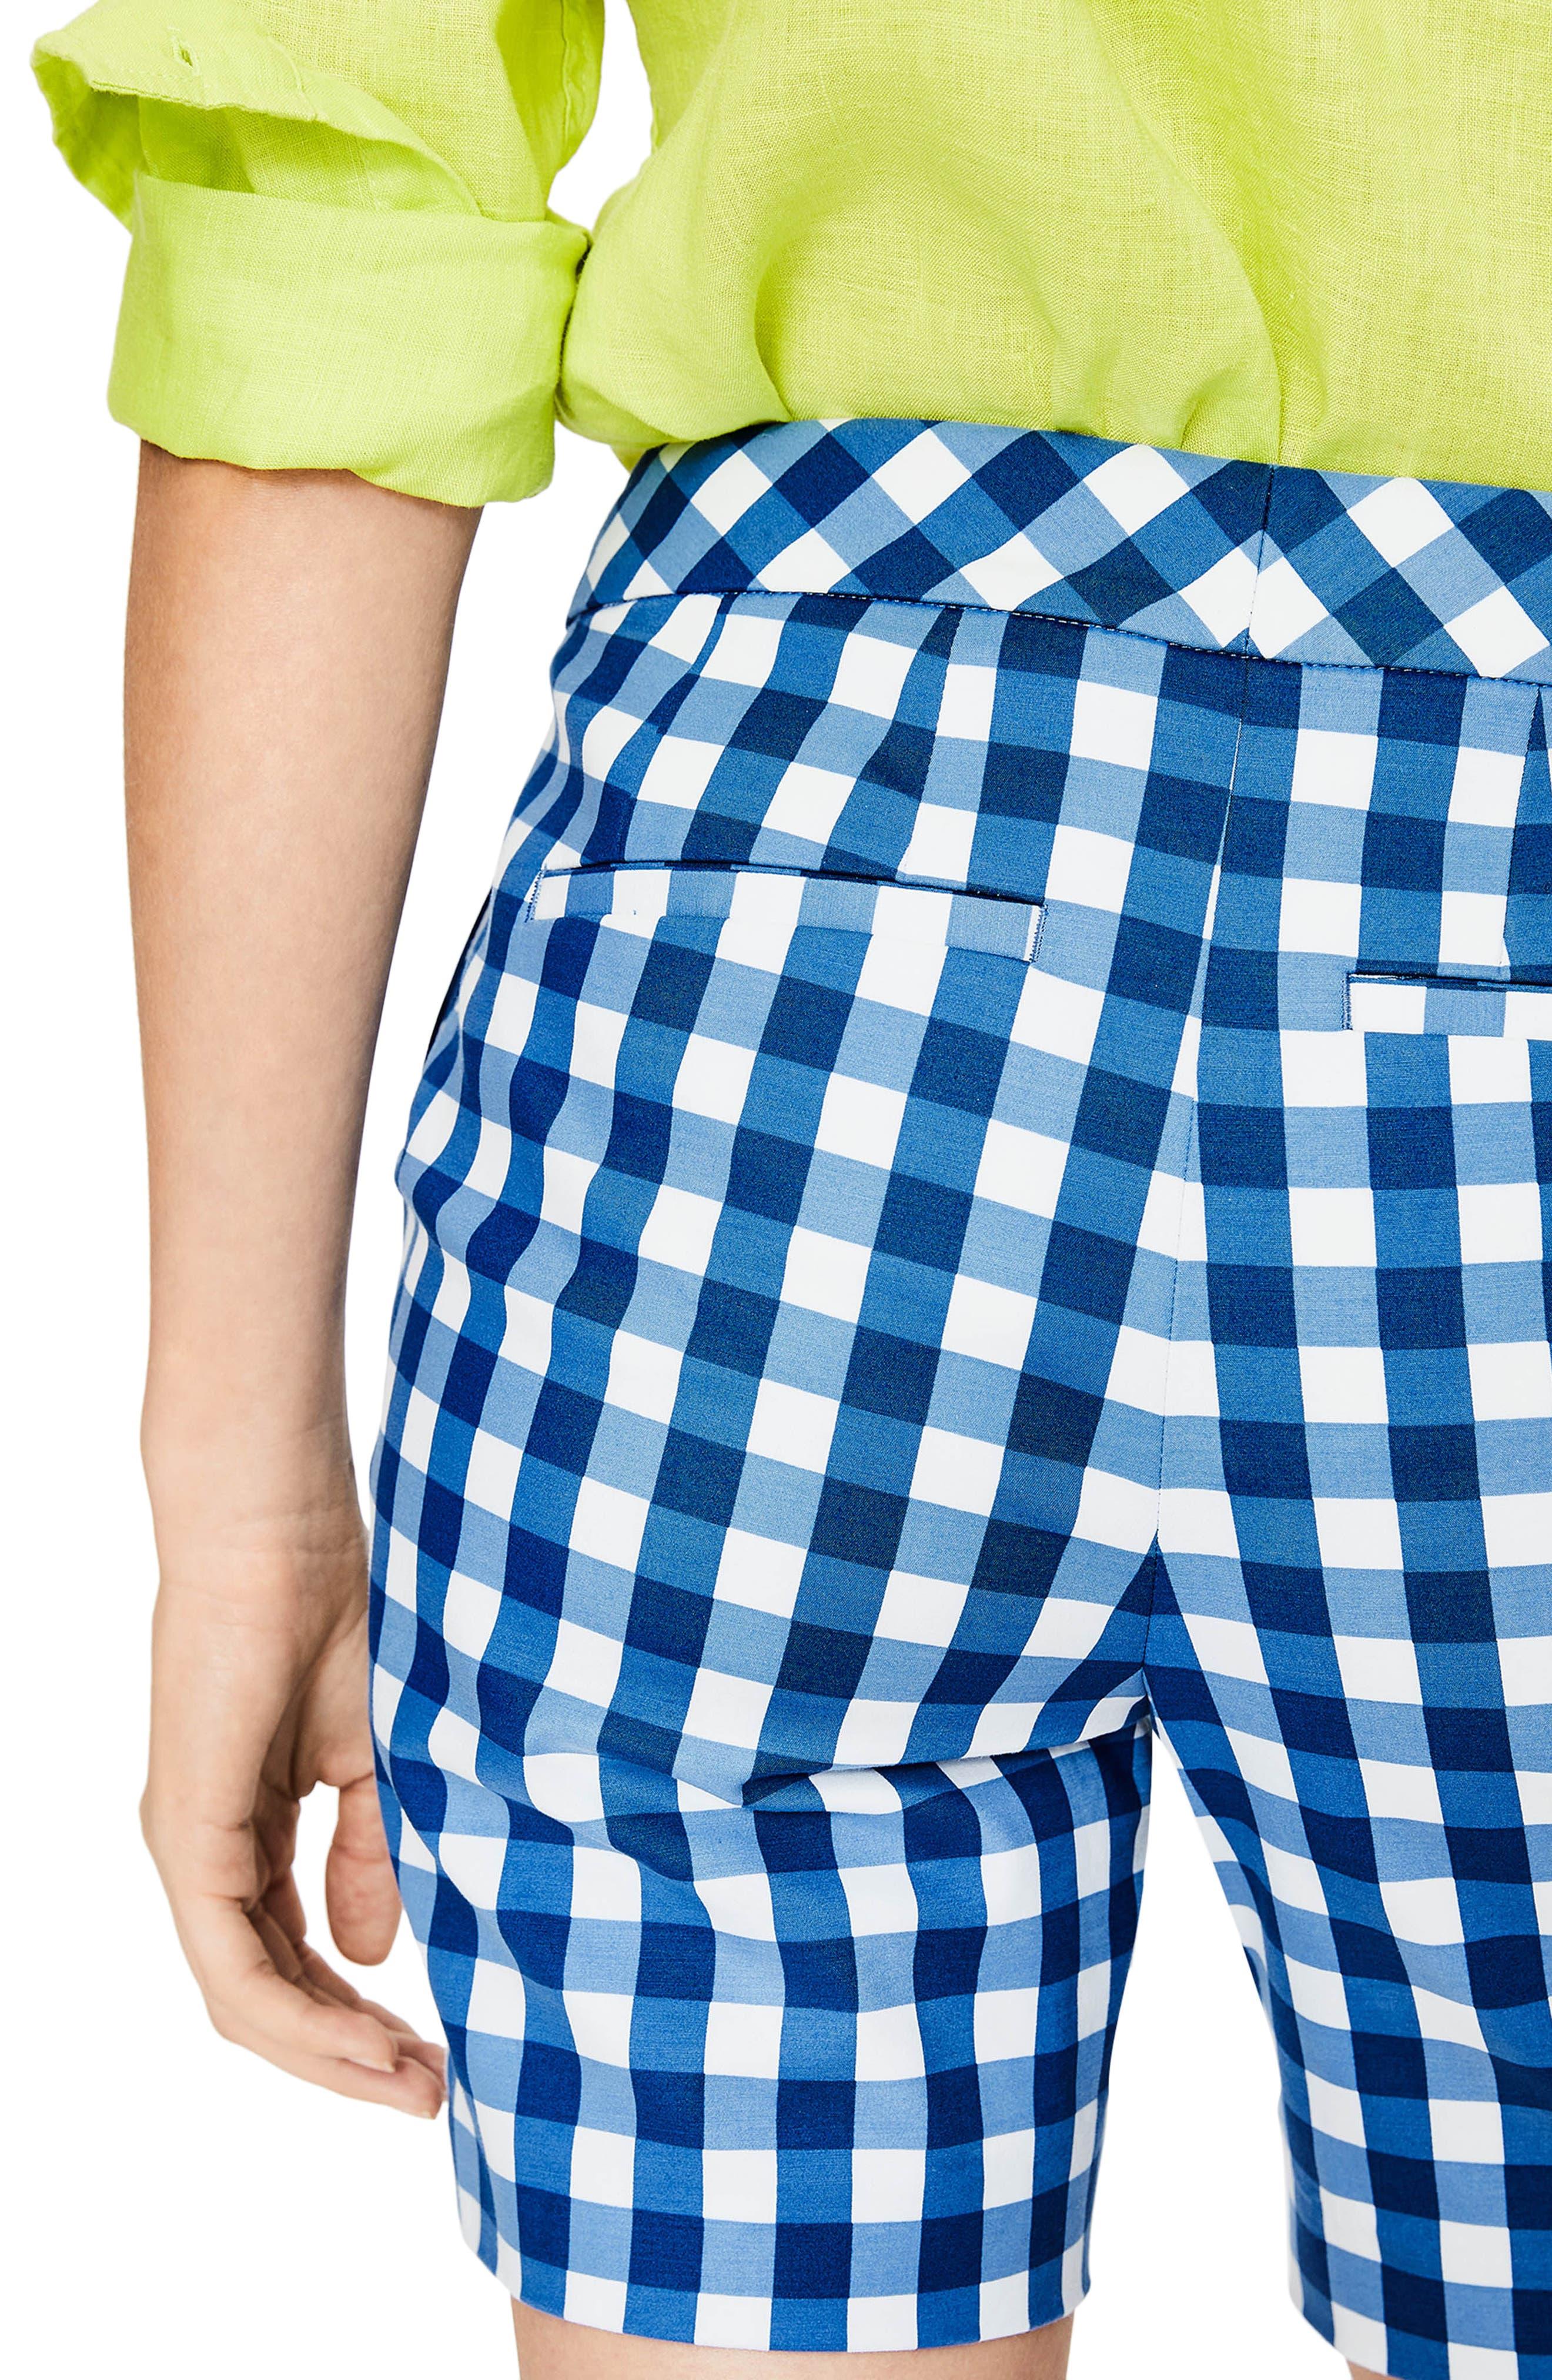 Richmond Check Shorts,                             Alternate thumbnail 4, color,                             Riviera Blue Gingham